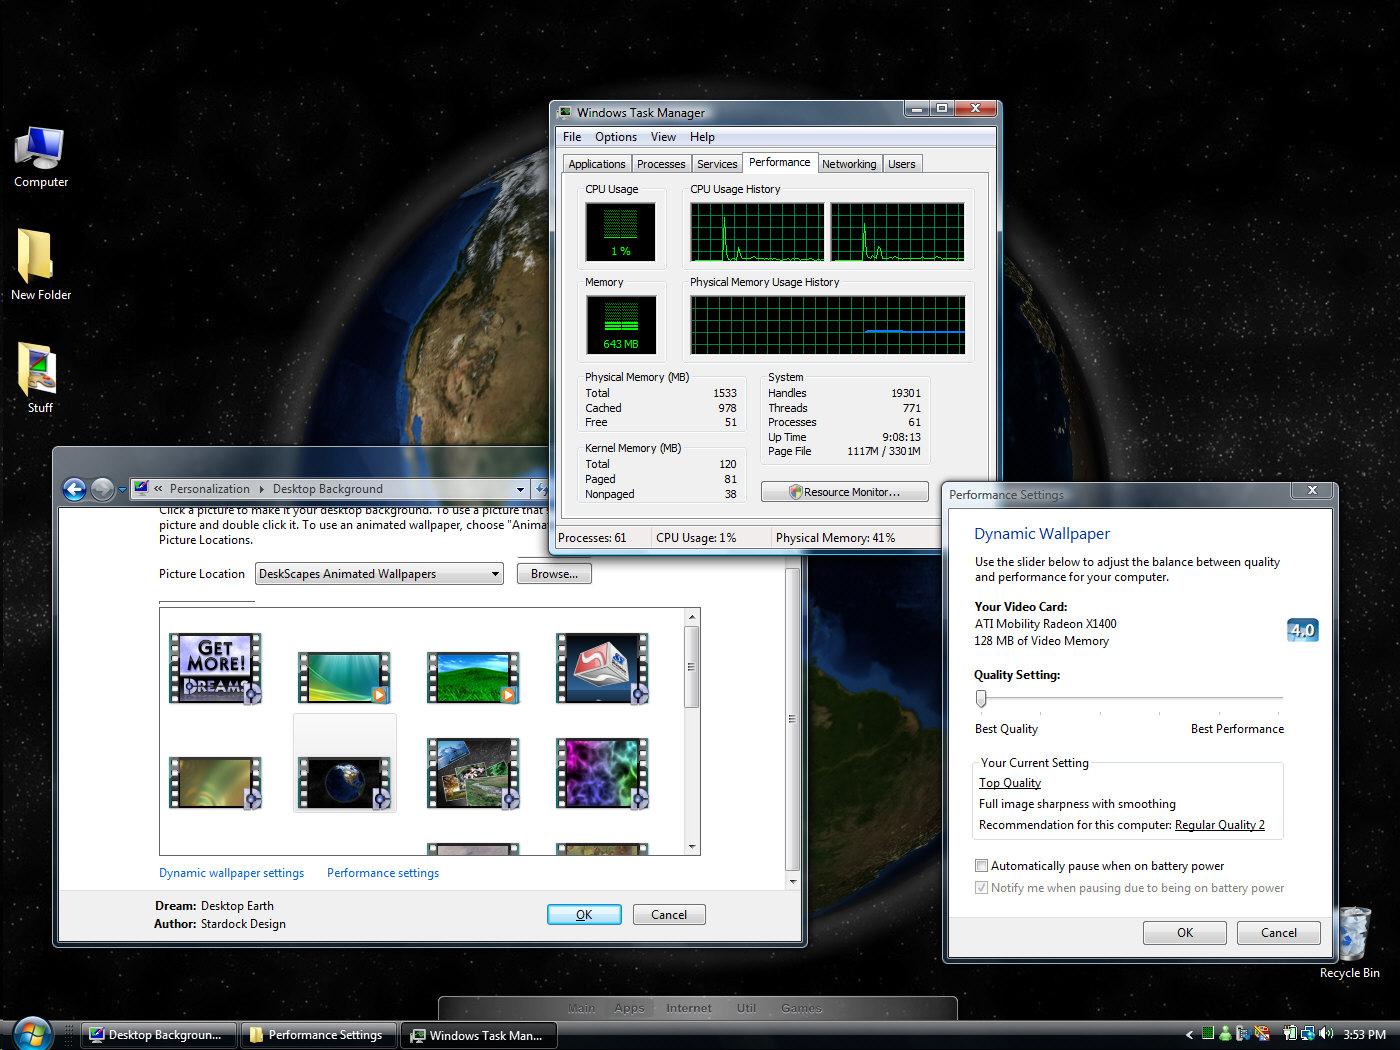 deskscapes 2.0 animated